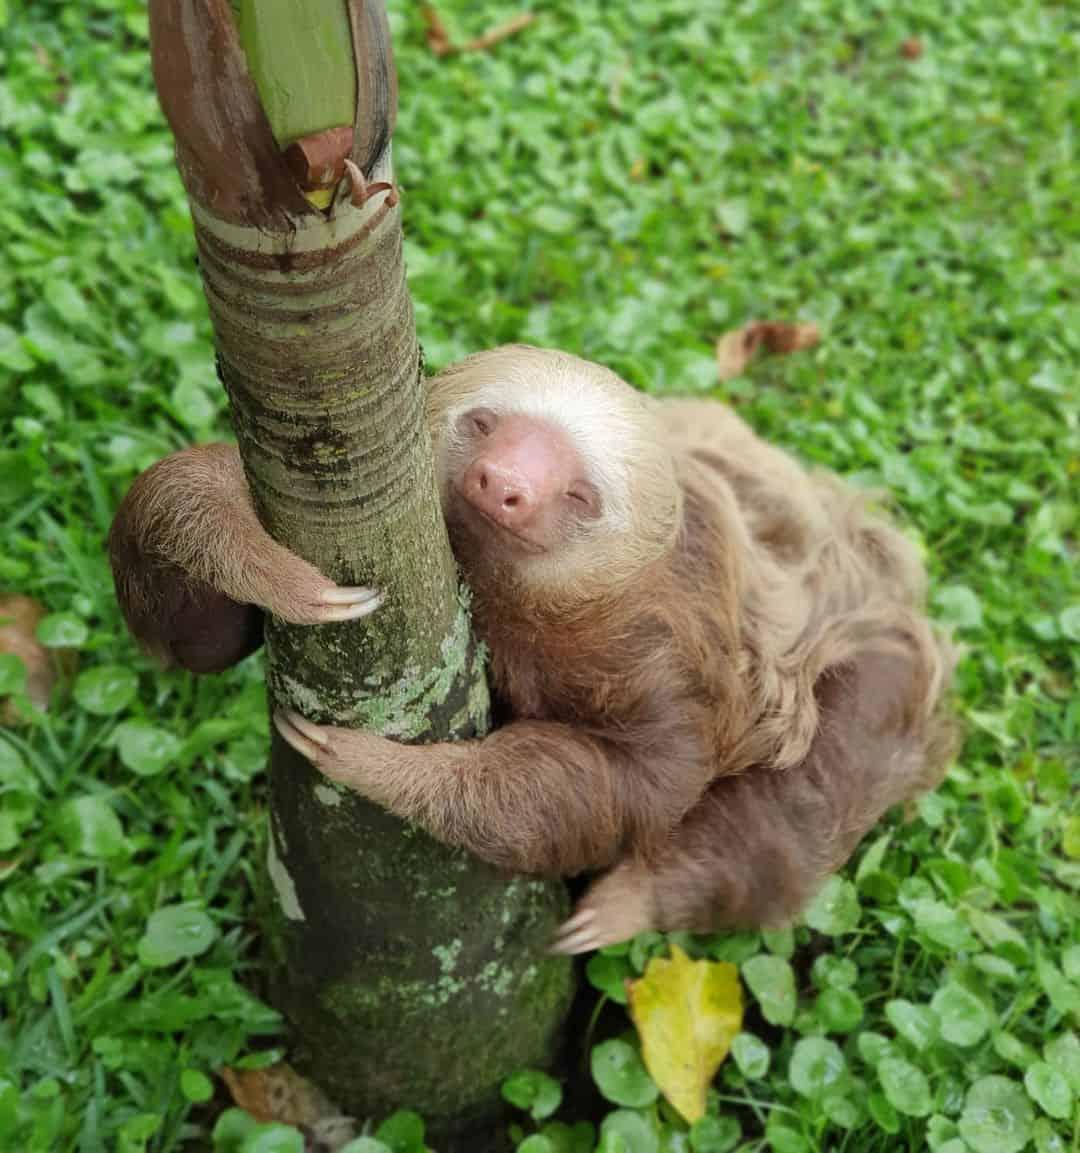 Grumpy the sloth, the 2019 Sloth Ironman Games Champion.